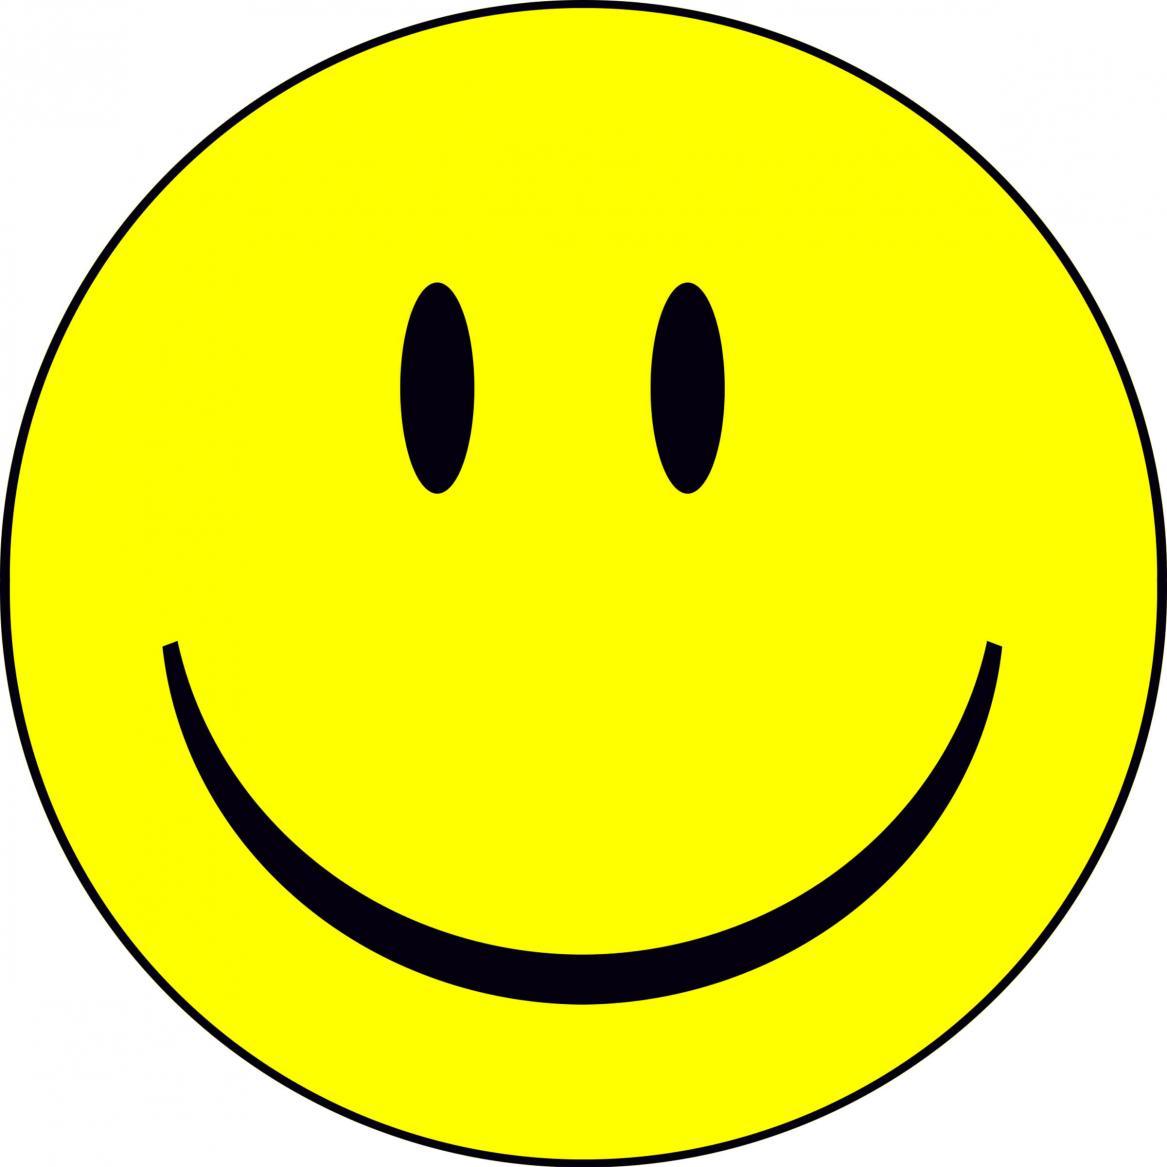 smiley face clip art emotions-smiley face clip art emotions-0